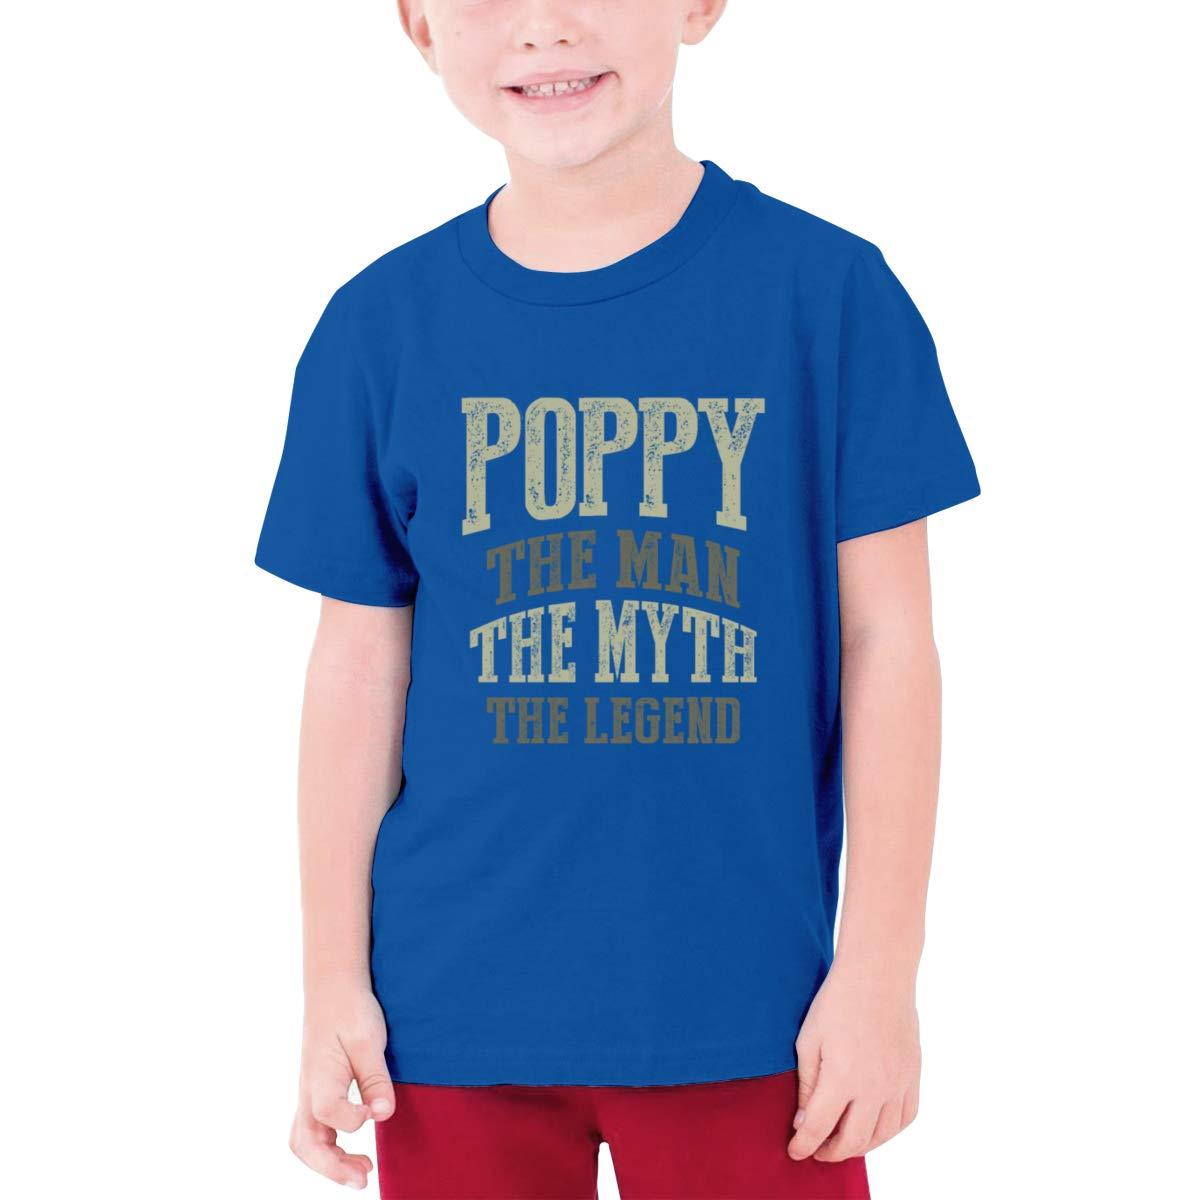 Poppy The Man The Myth The Legend Boys Short-Sleeved T-Shirt